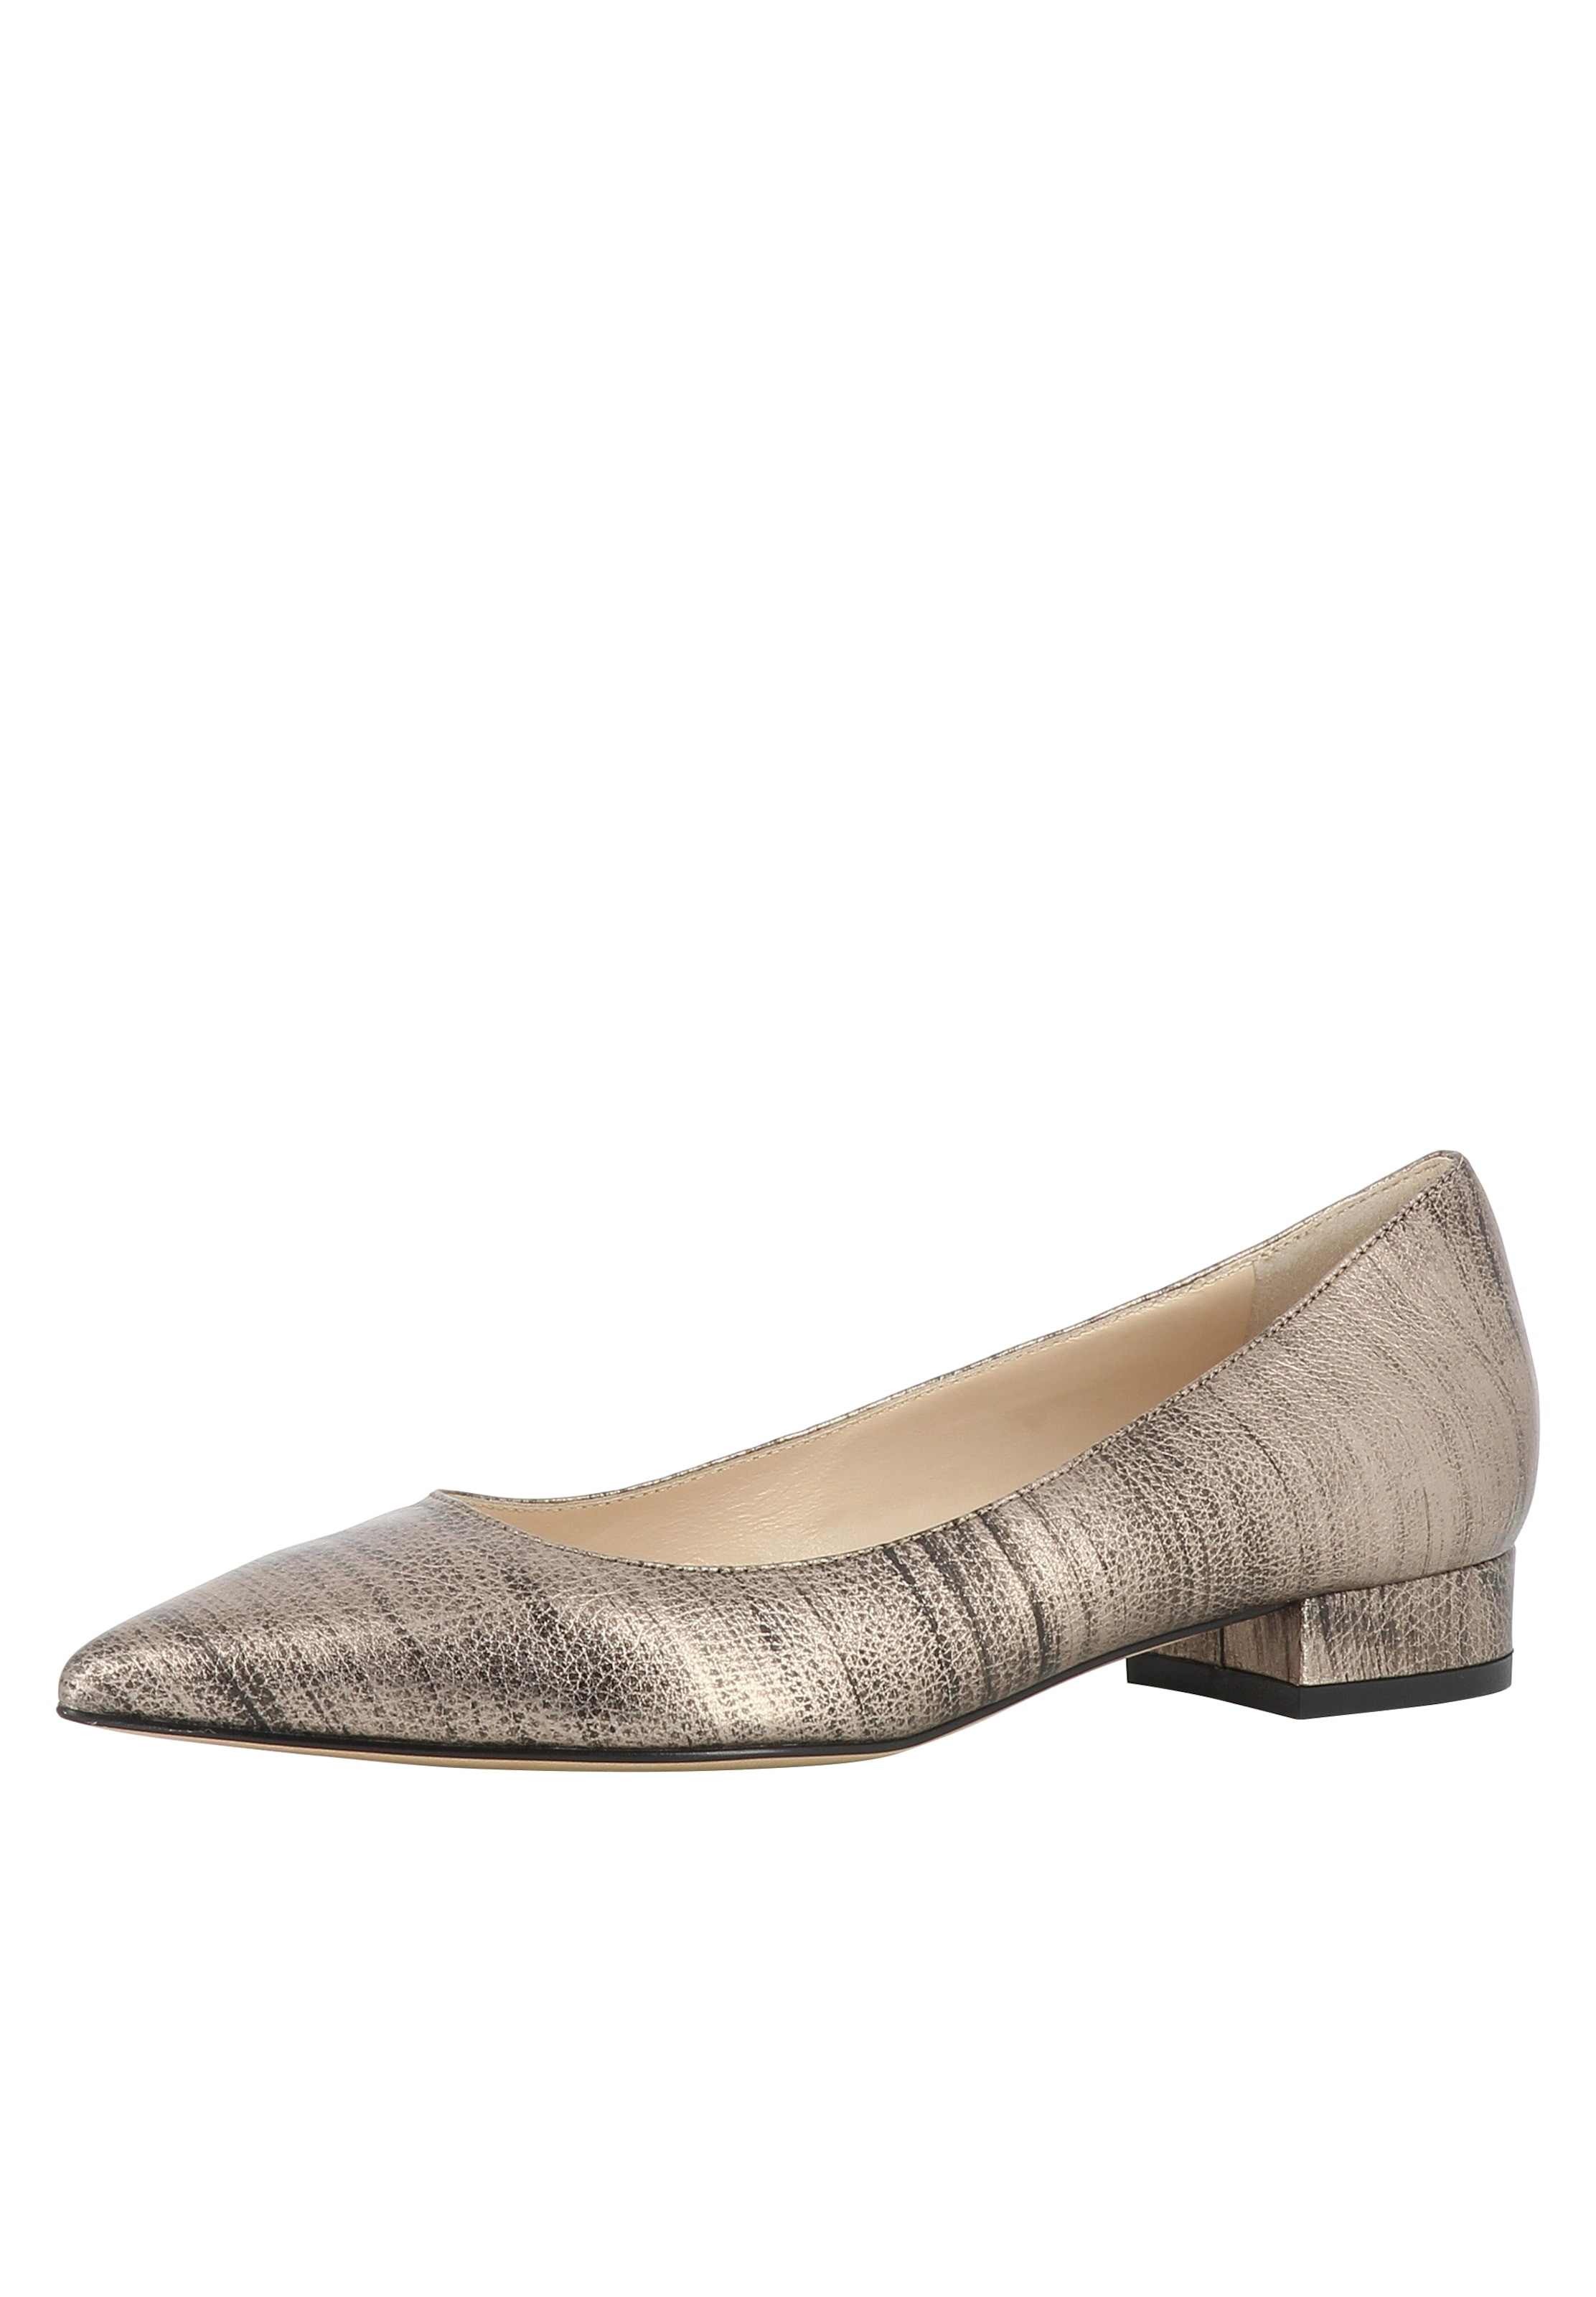 EVITA Damen Pumps FRANCA Verschleißfeste billige Schuhe